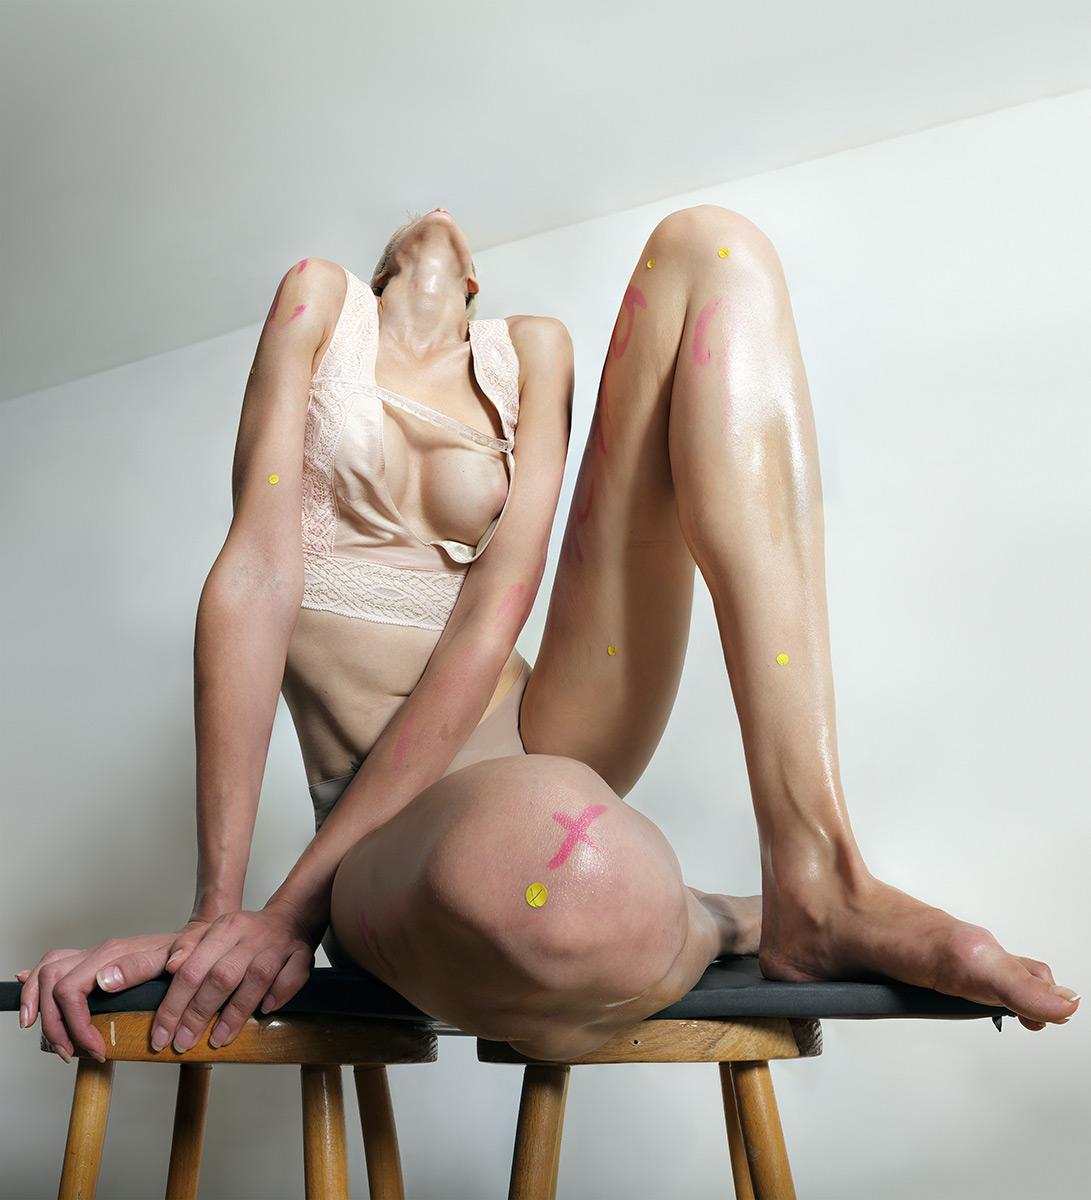 1. © Roger Weiss, hd070816_129ph, human dilatations